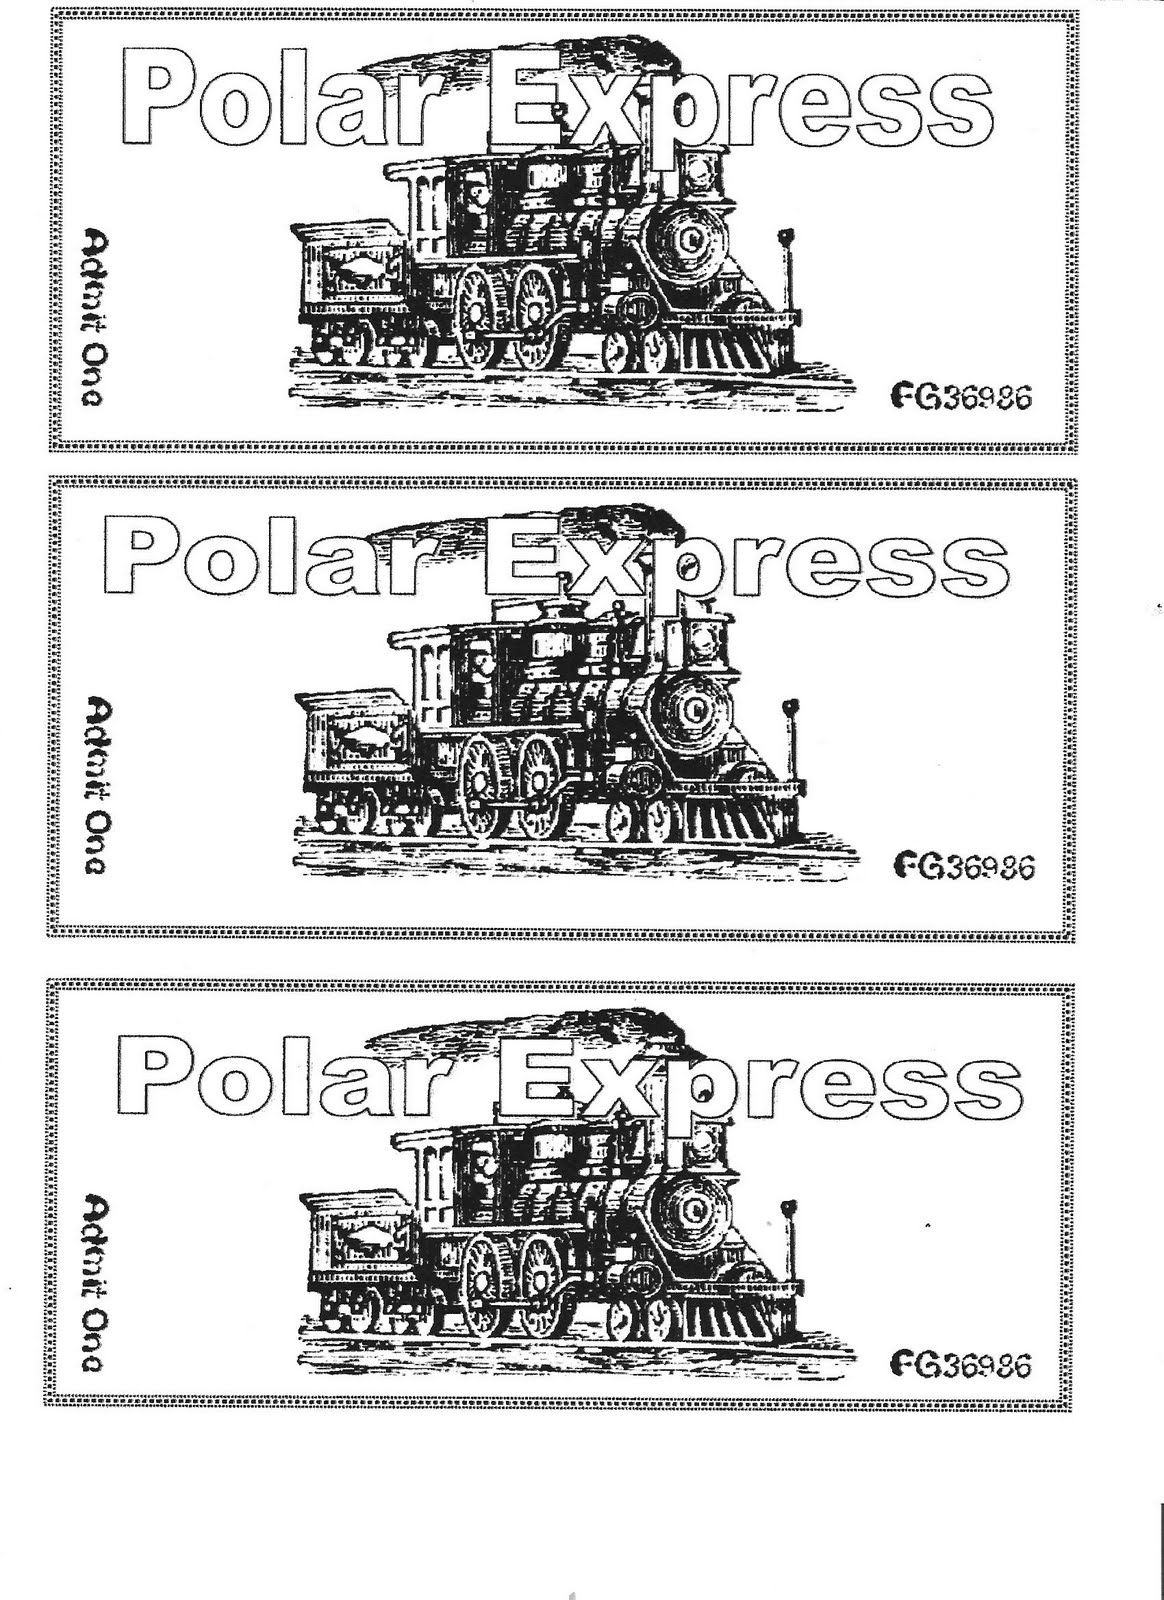 Polar Express Tickets